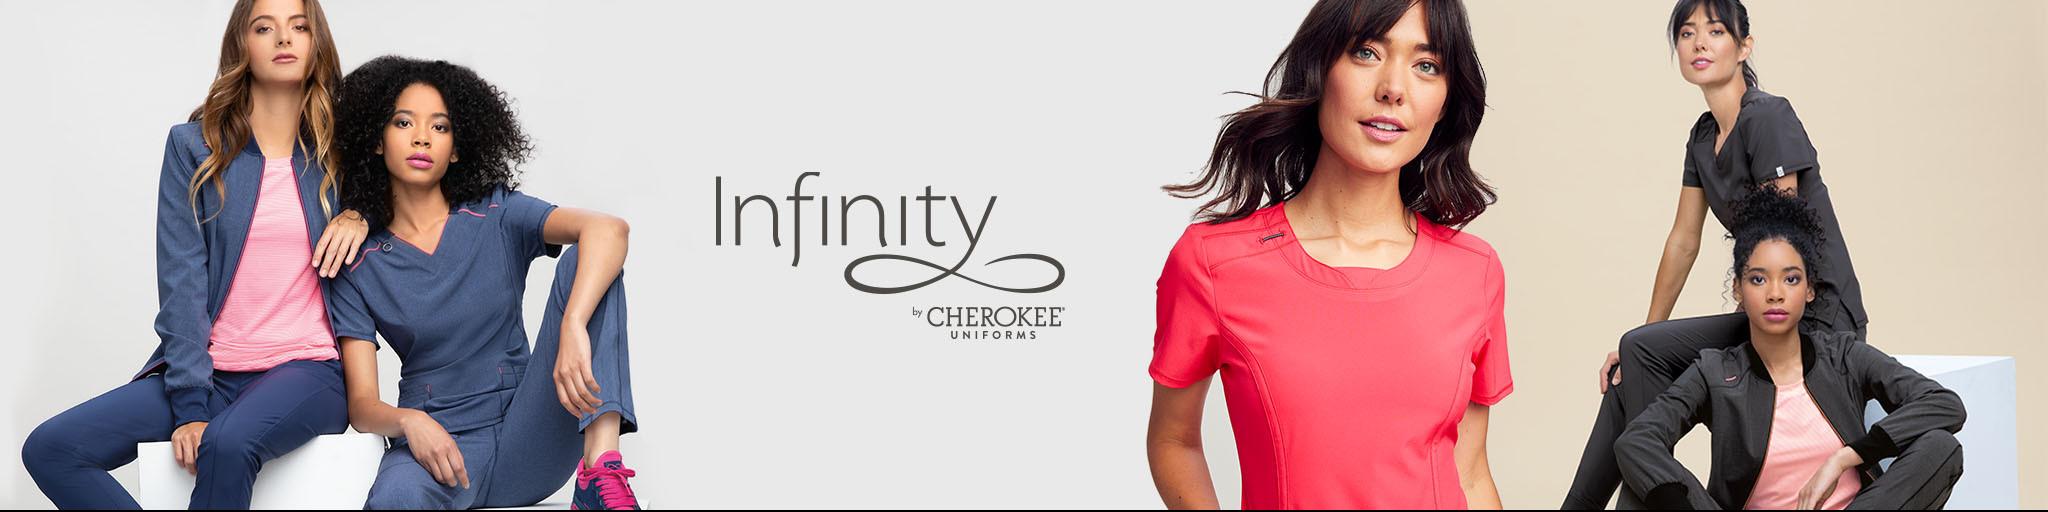 CherokeeInfinityApril2019.png